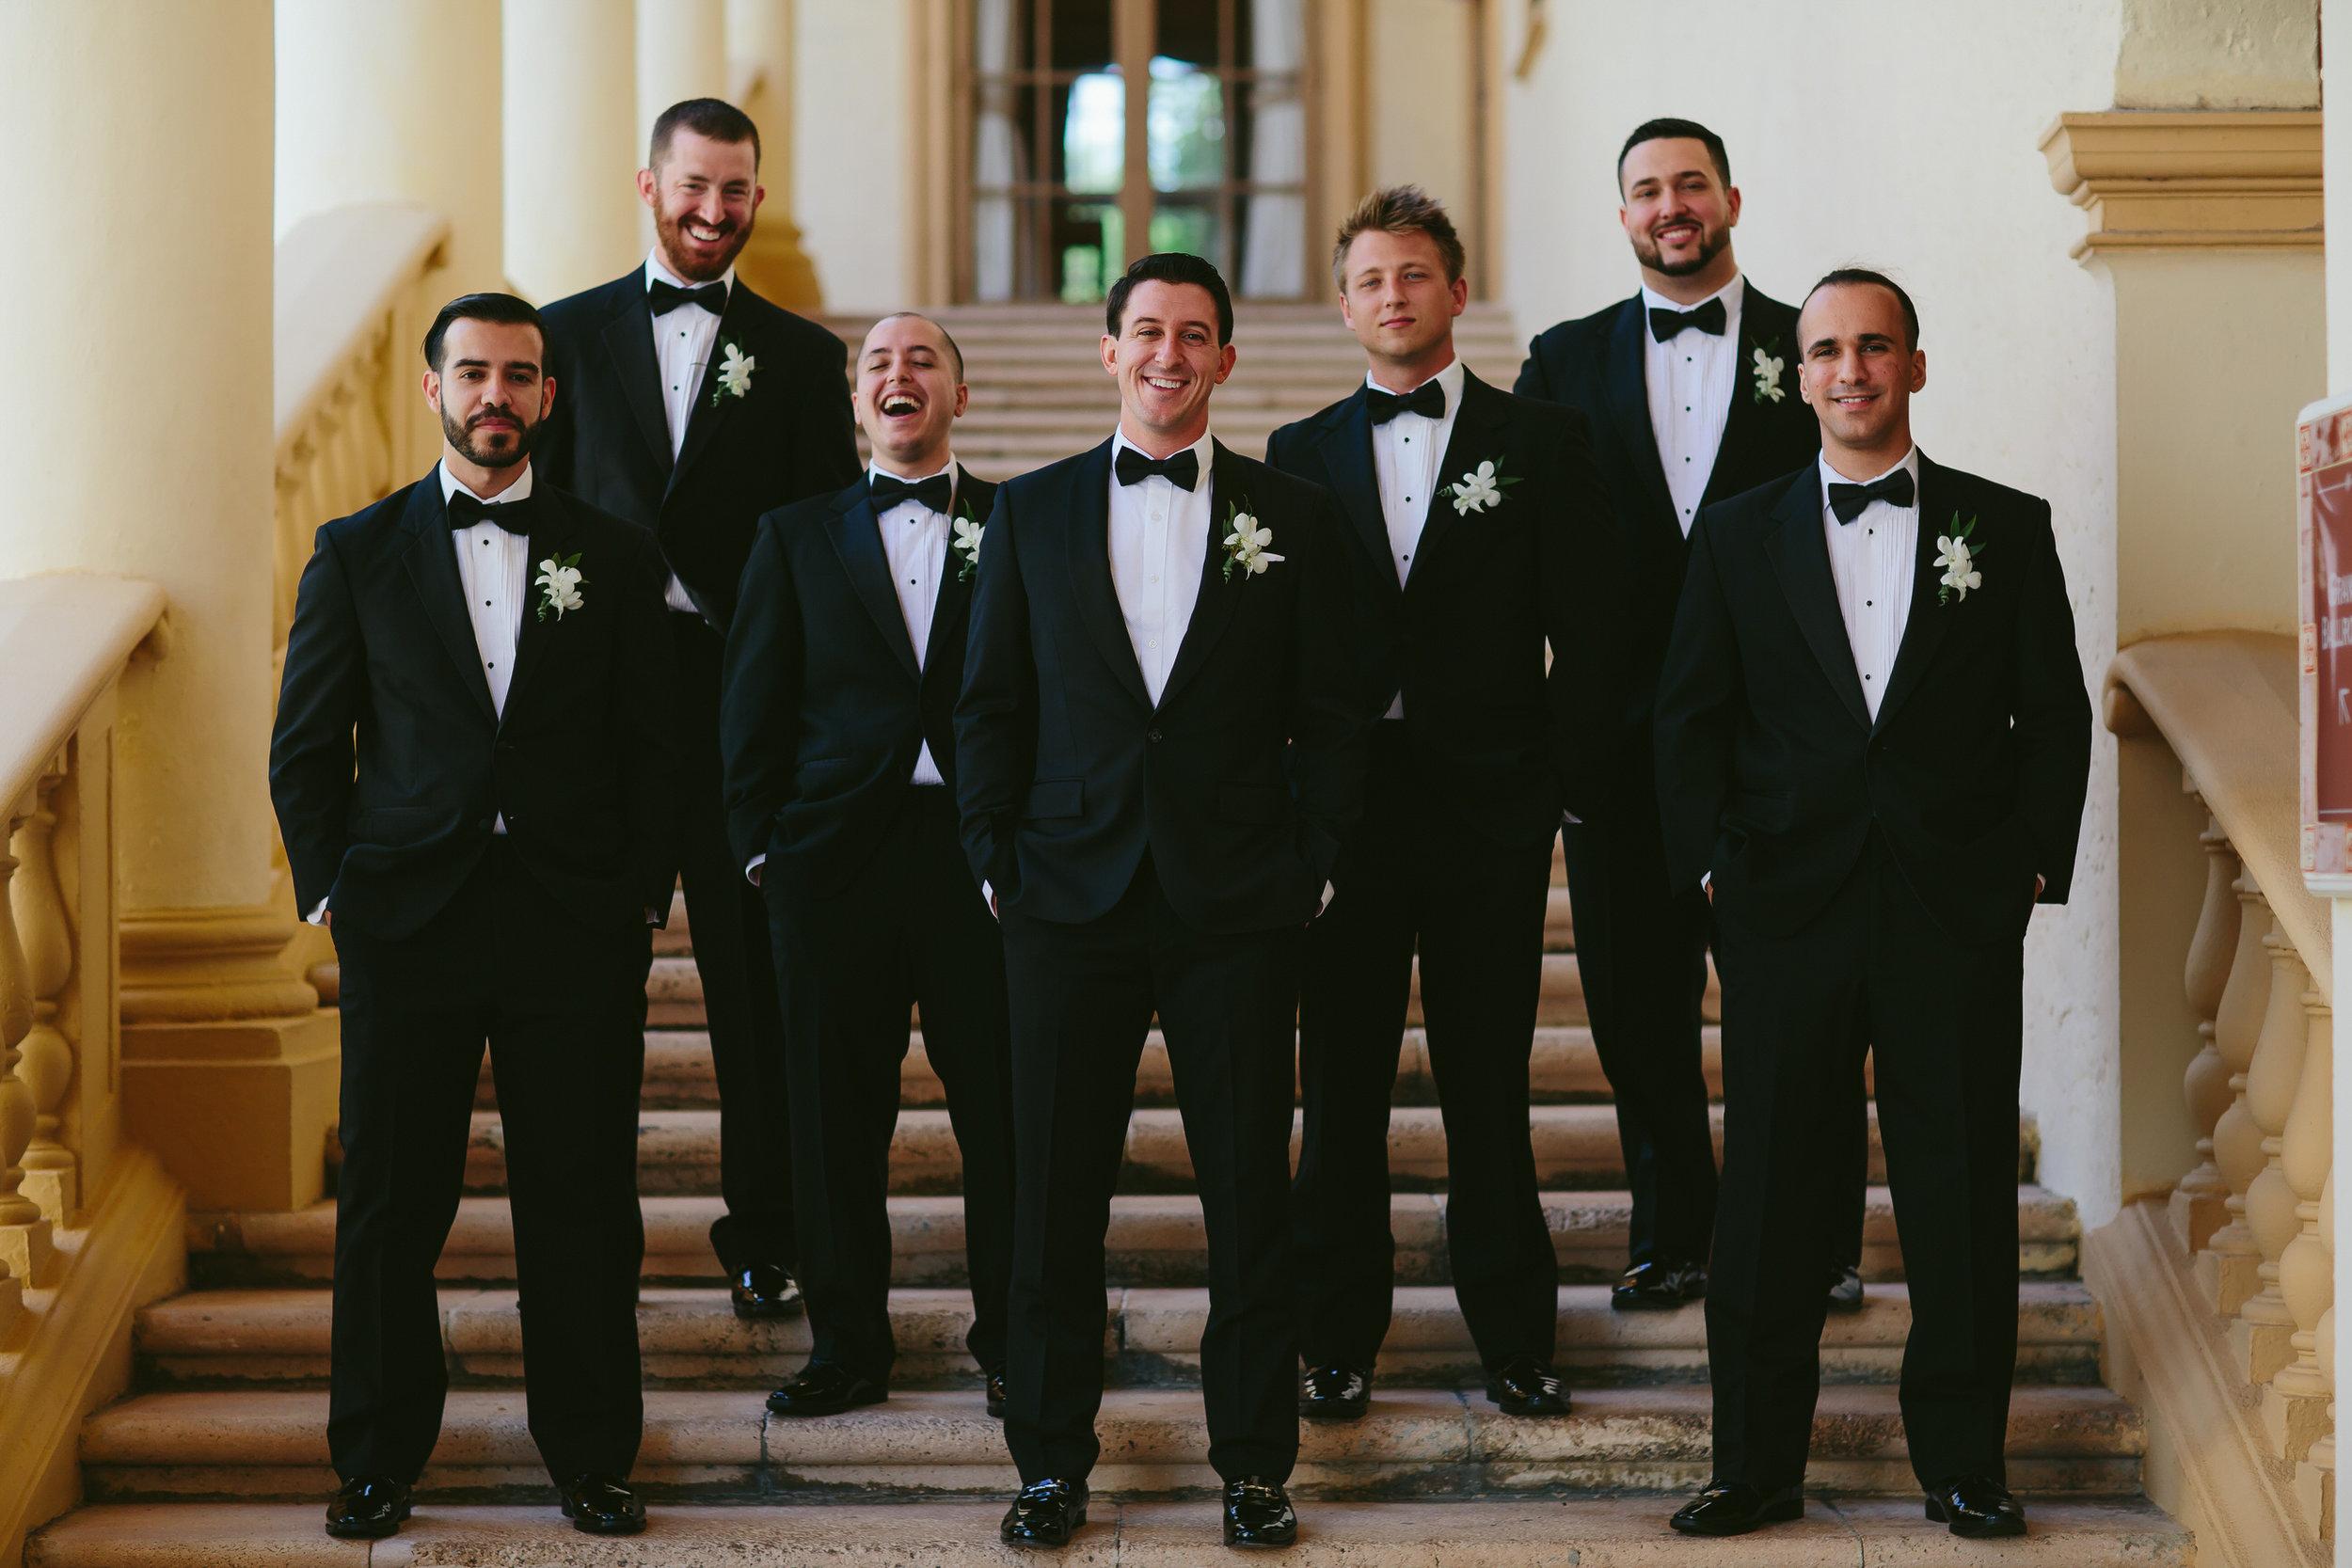 biltmore-wedding-groom-getting-ready-steph-lynn-photo-miami-26.jpg